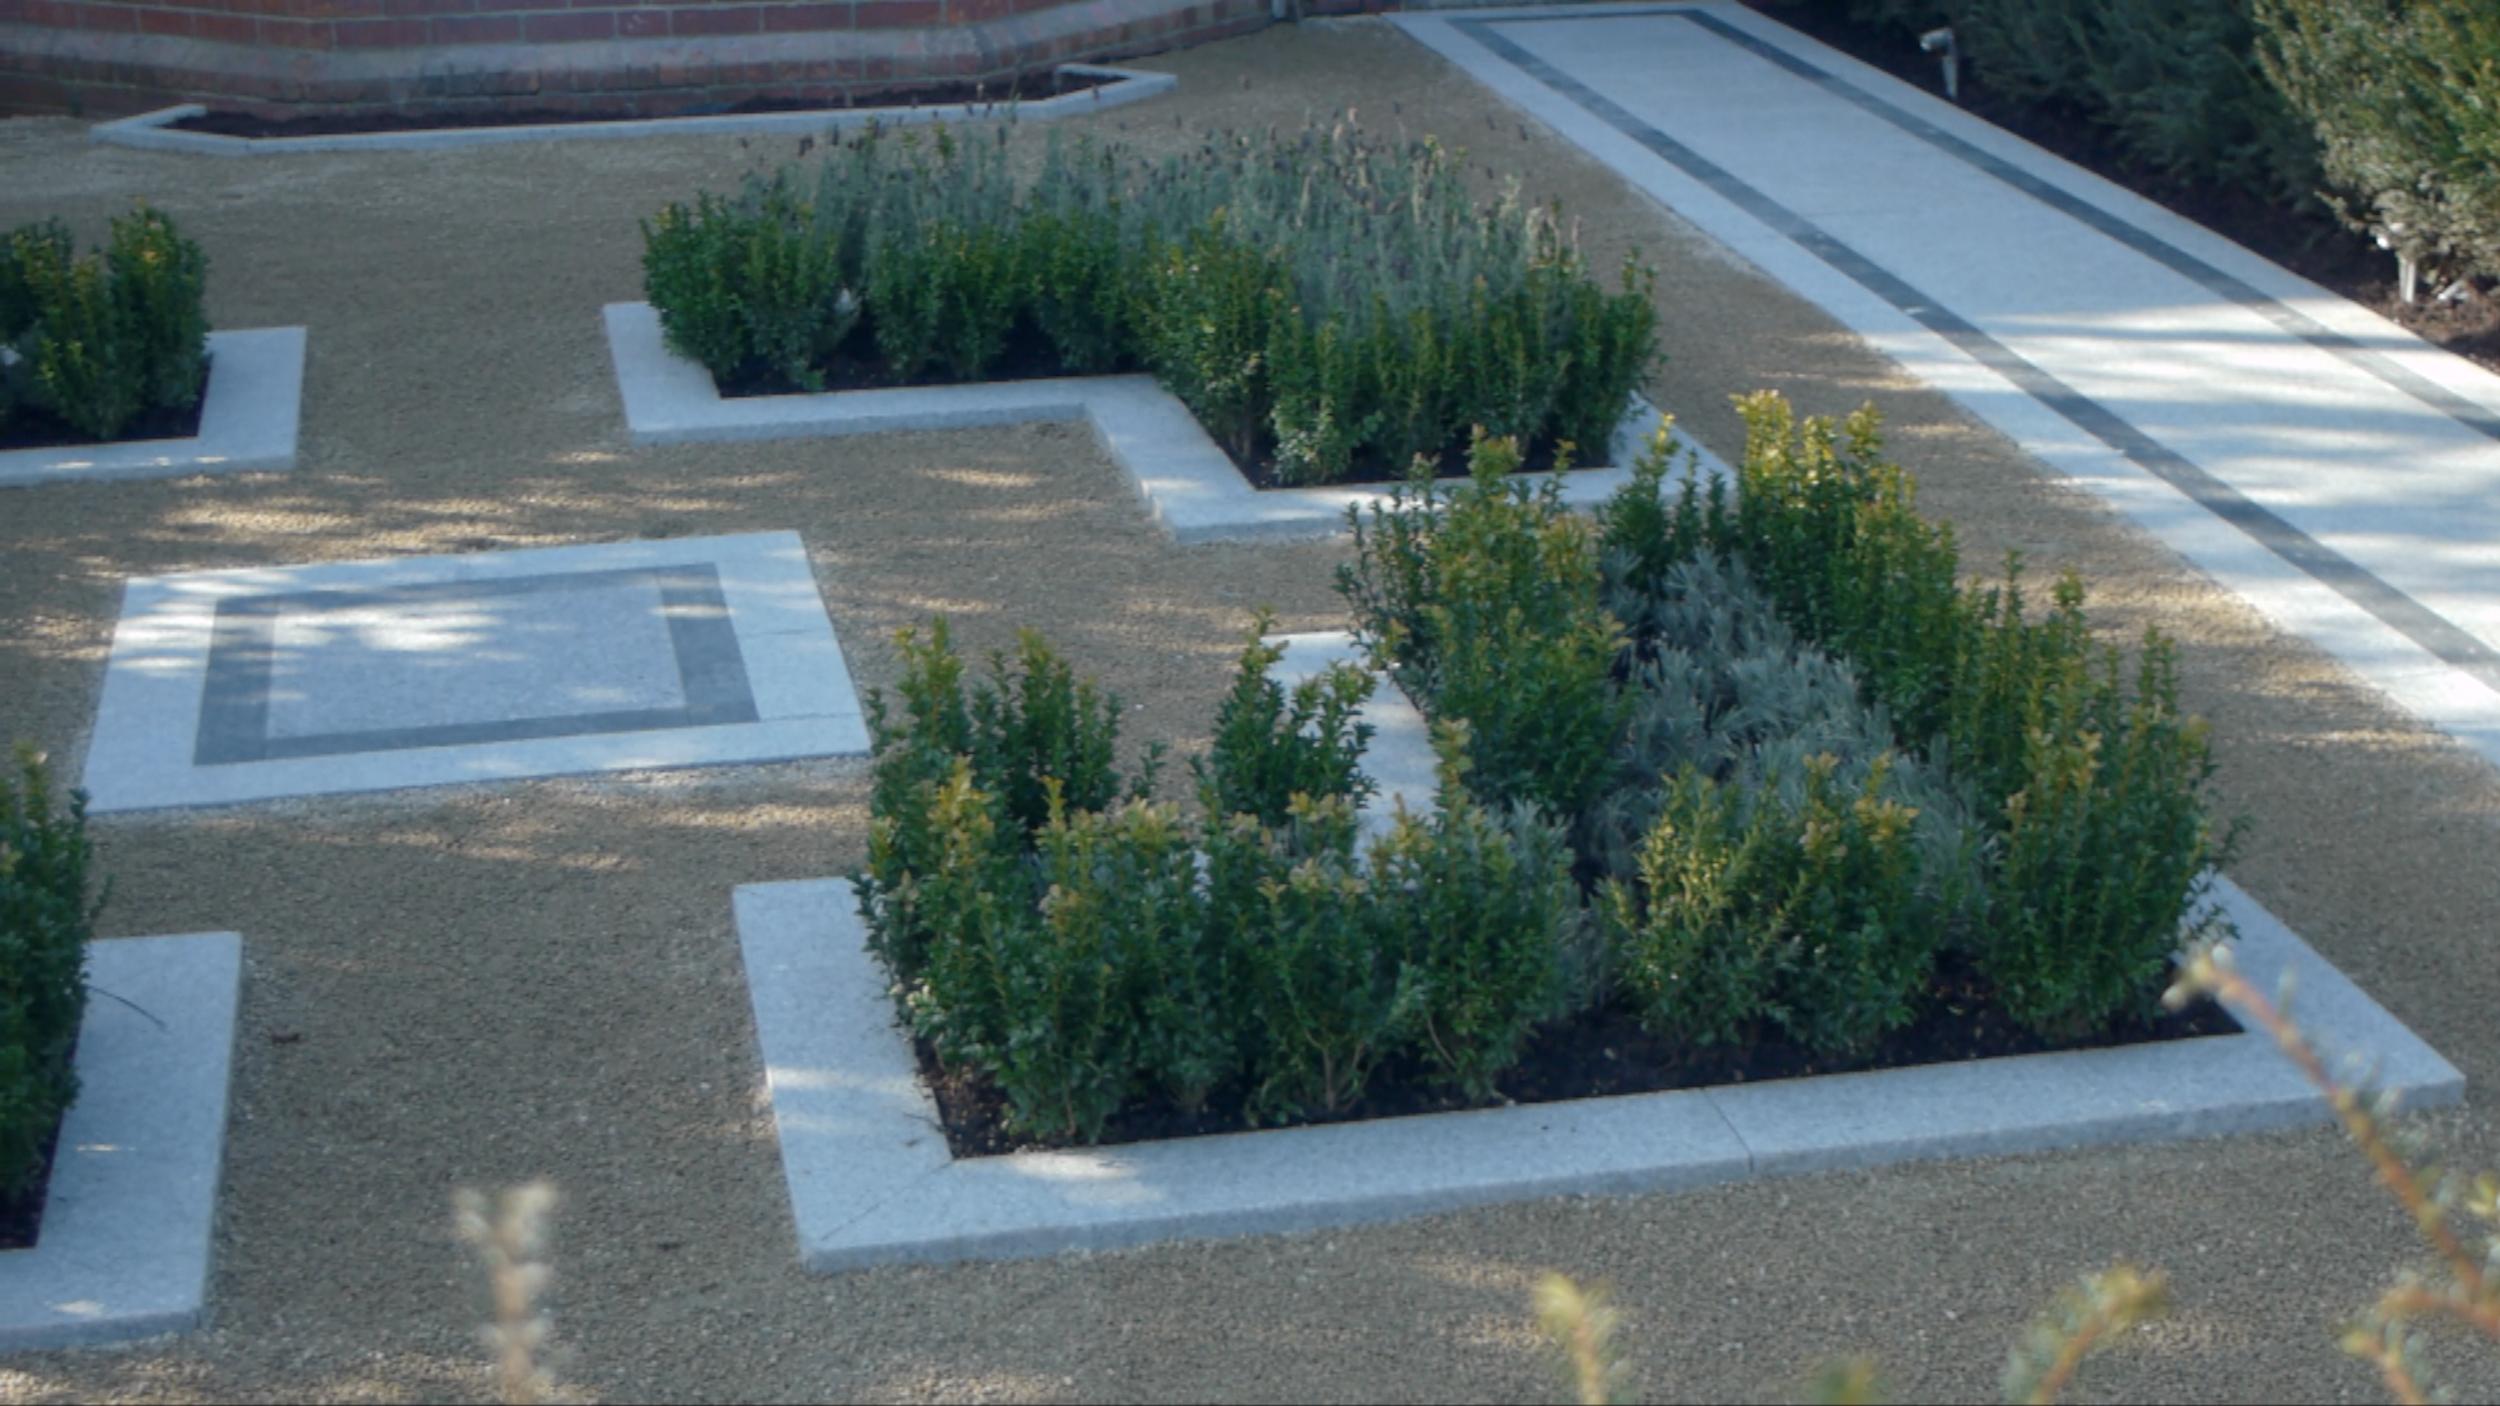 Buxus Garden with Lander